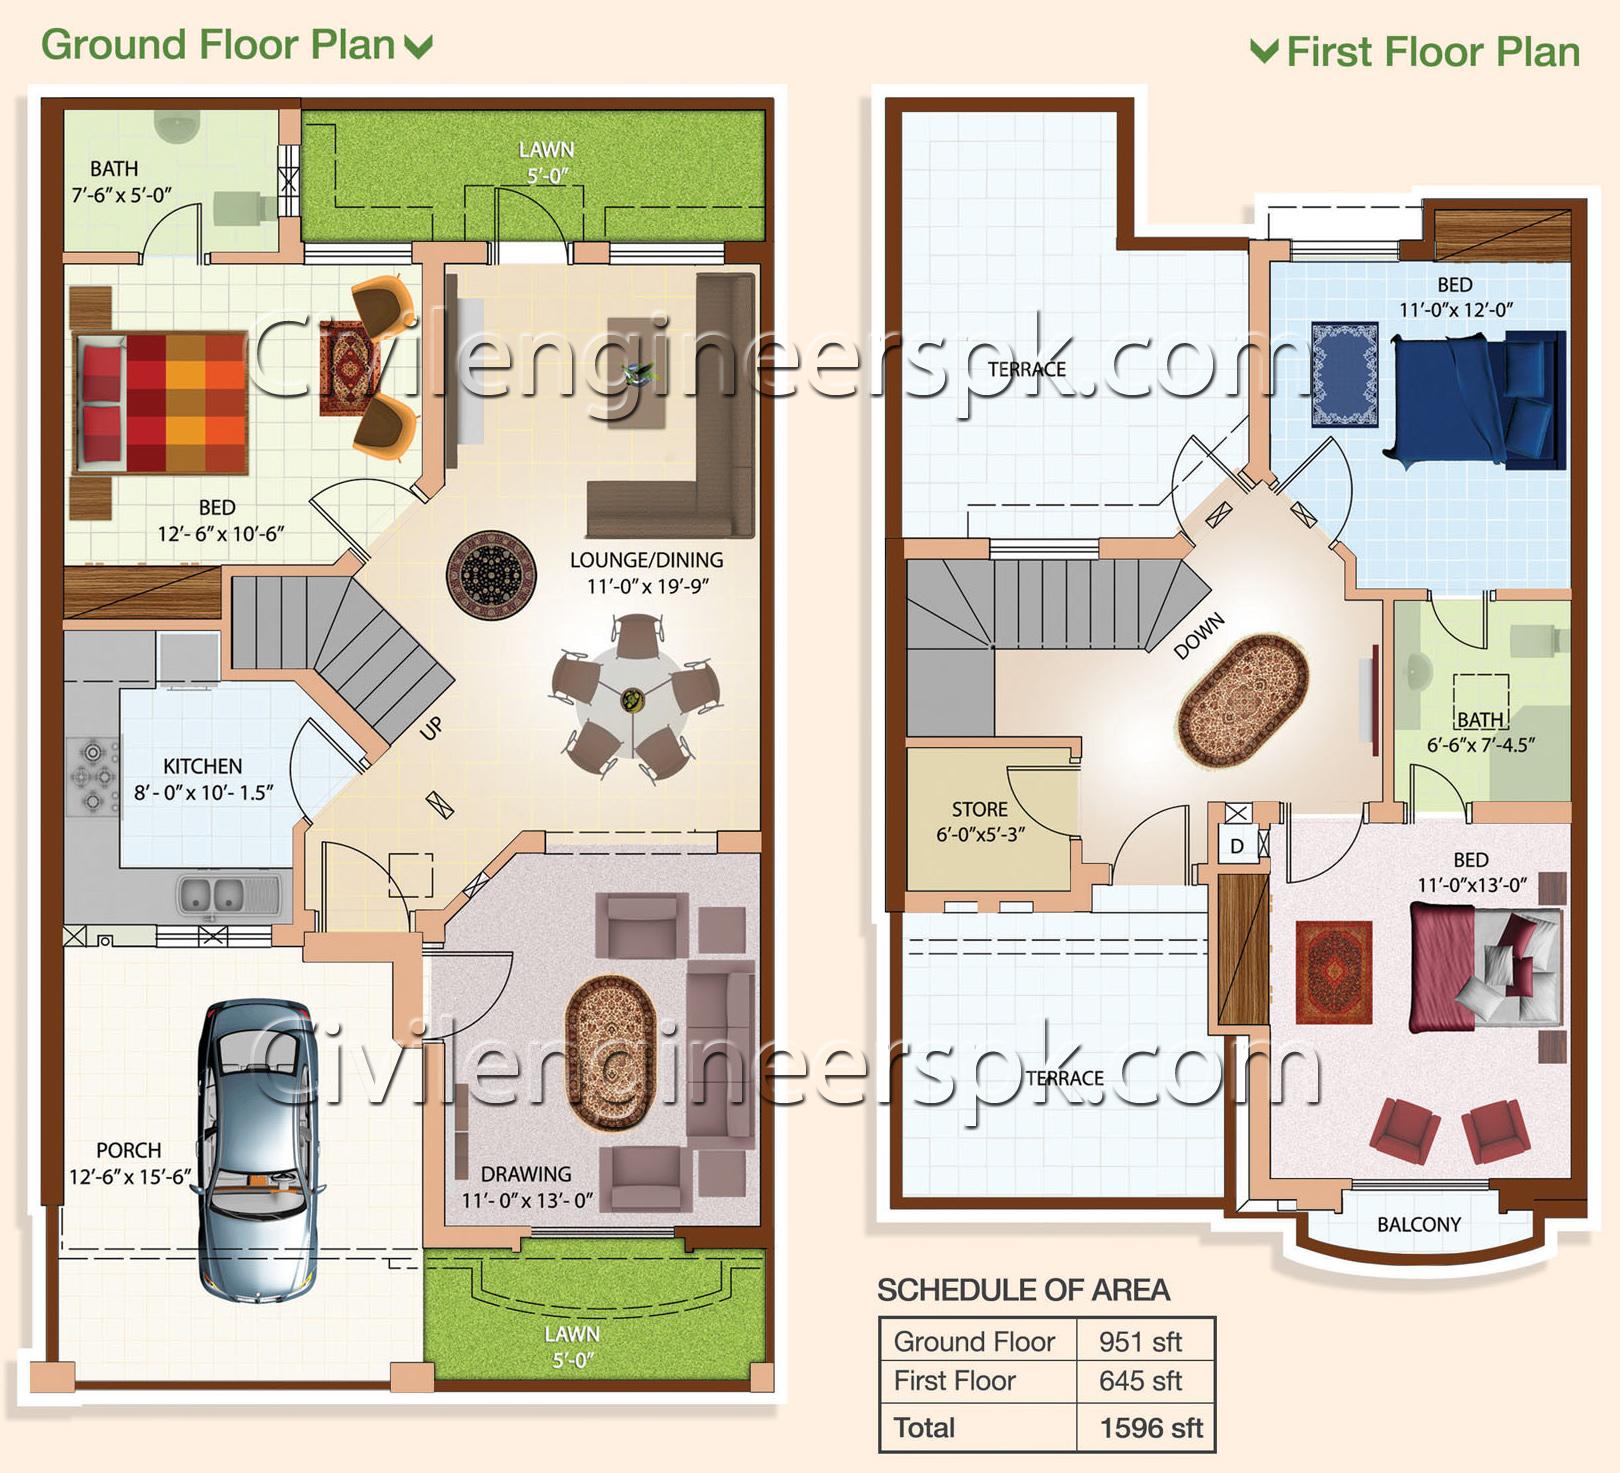 Home Design 3d Map: Civil Engineers PK